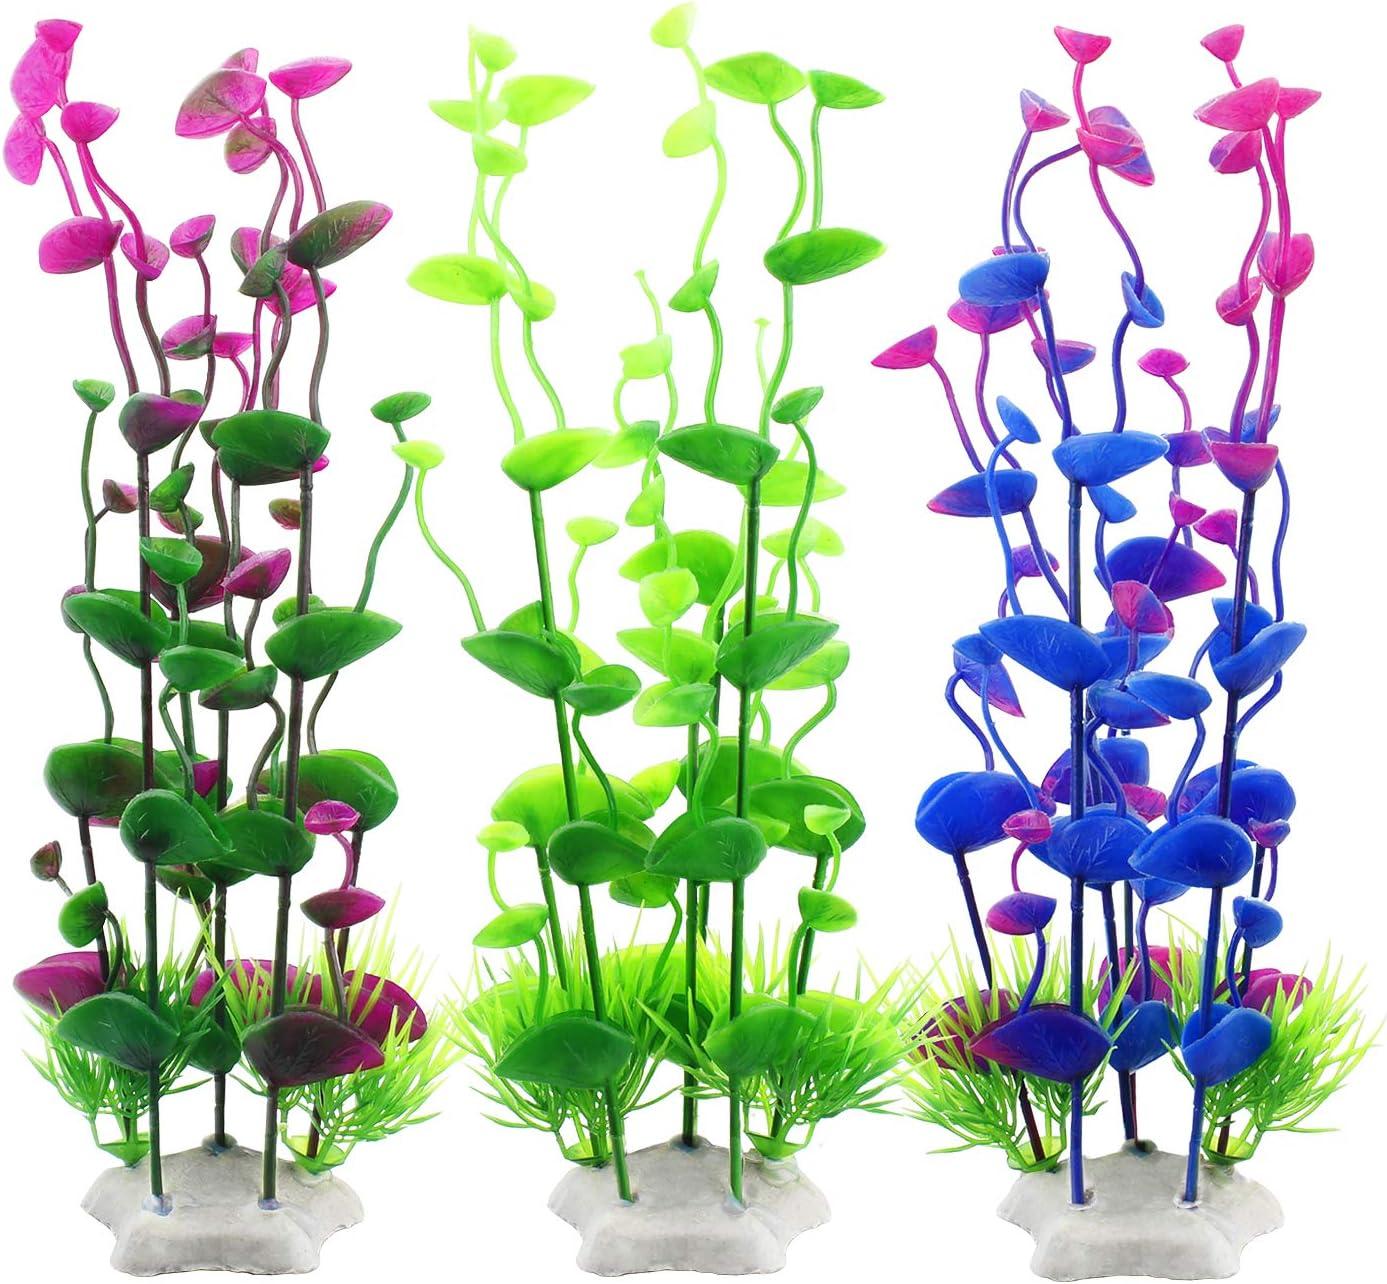 MyLifeUNIT Fish Tank Plants, Plastic Artificial Aquatic Plants for Aquarium Decorations, 9.5 Inches (Pack of 3)